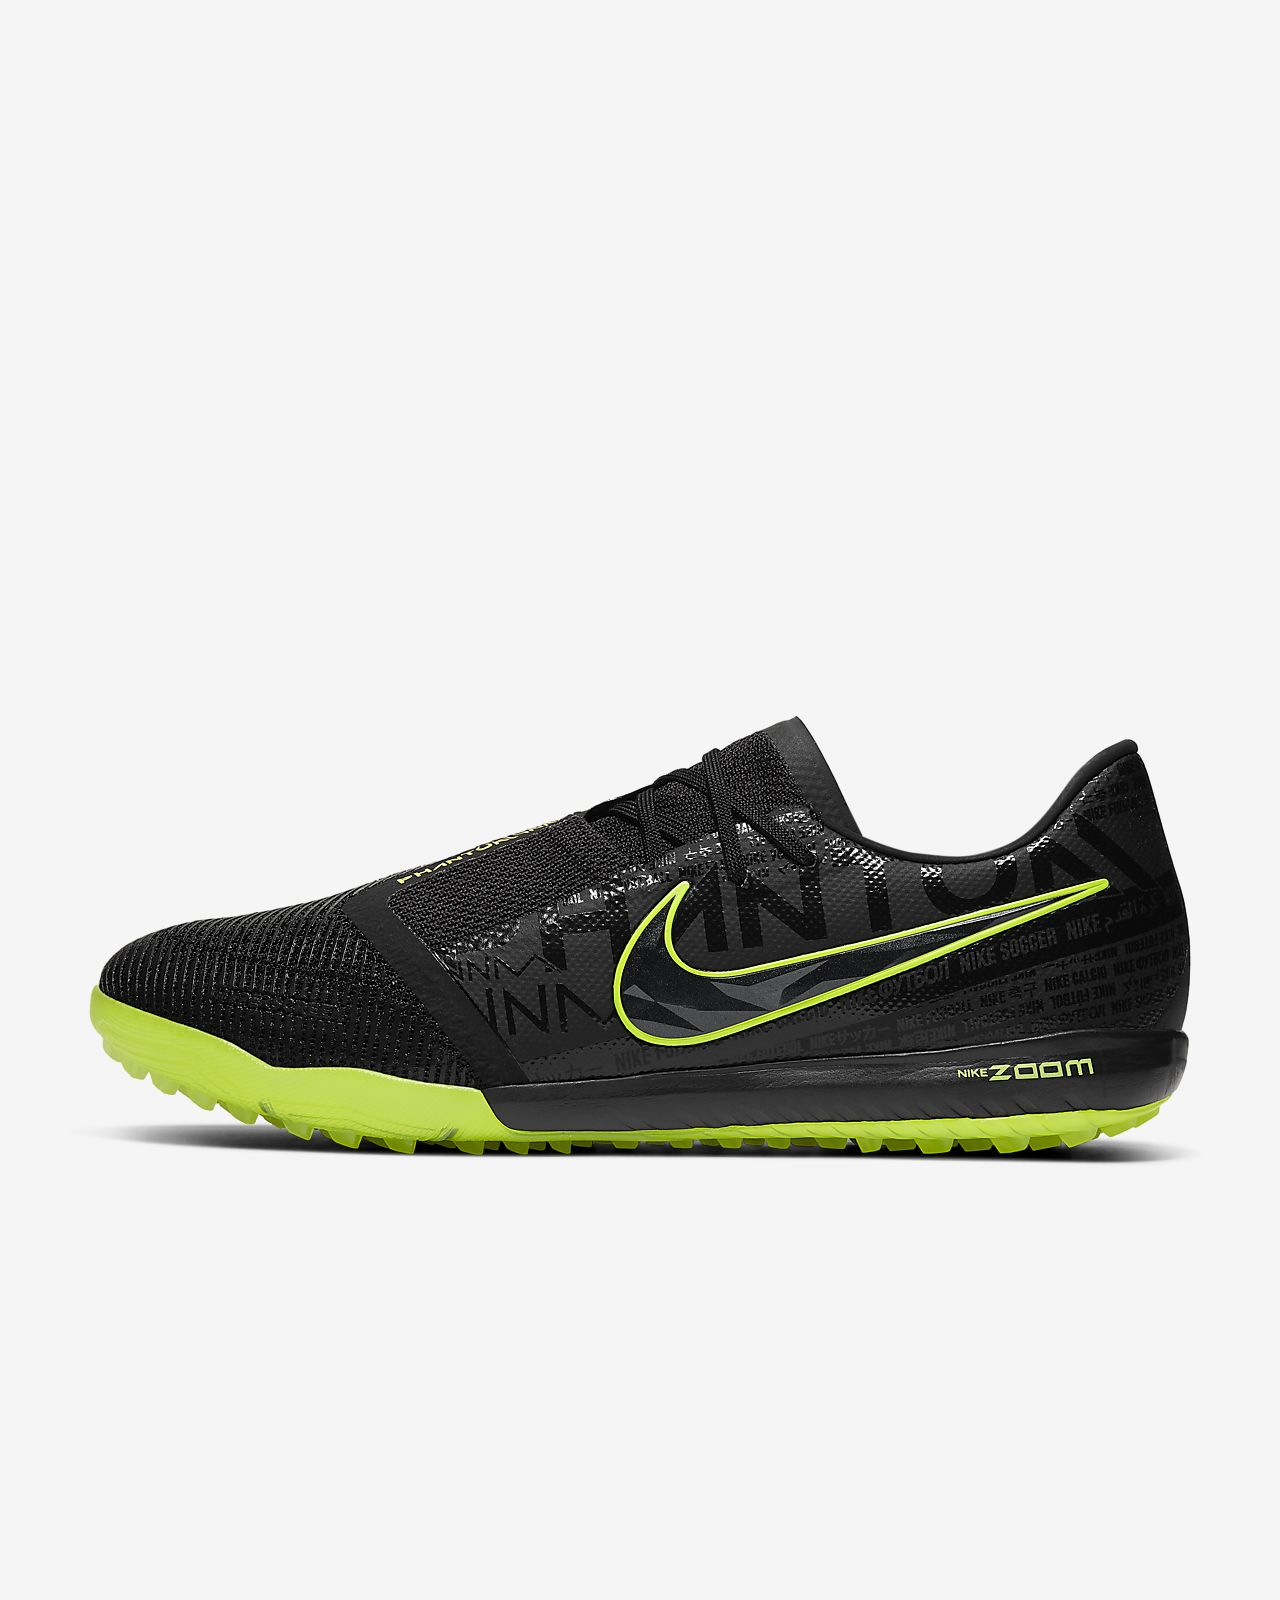 scarpe calcio uomo sintetico nike